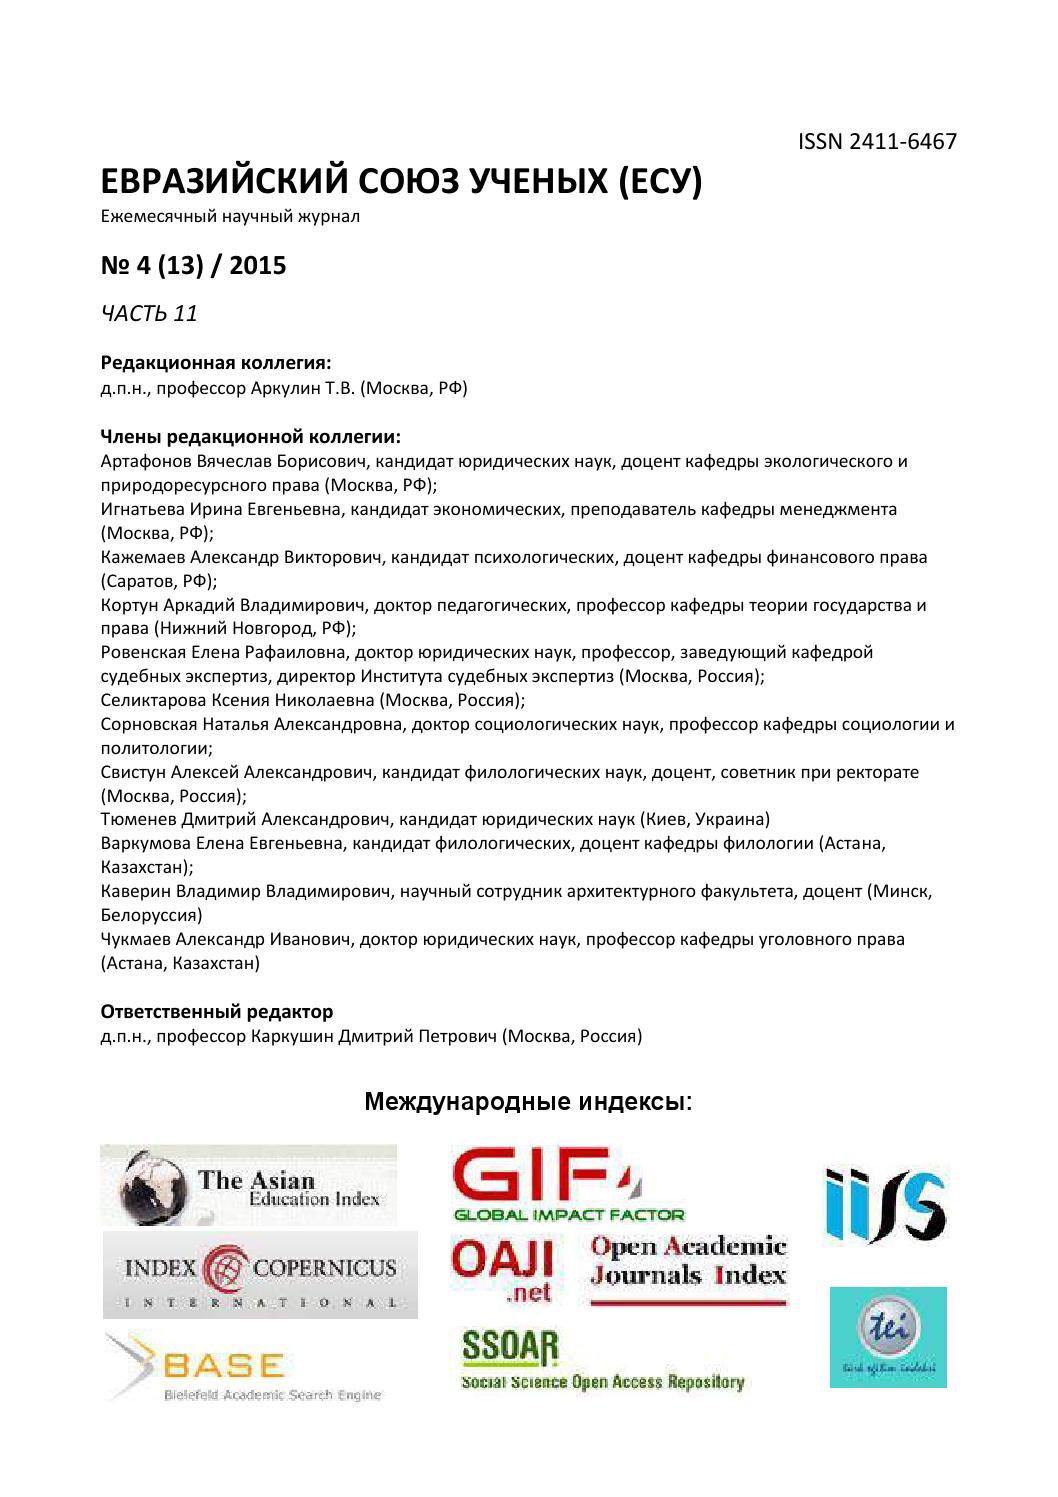 febb6fe3dbf4 Evro 13 p11 by euroasia science - issuu